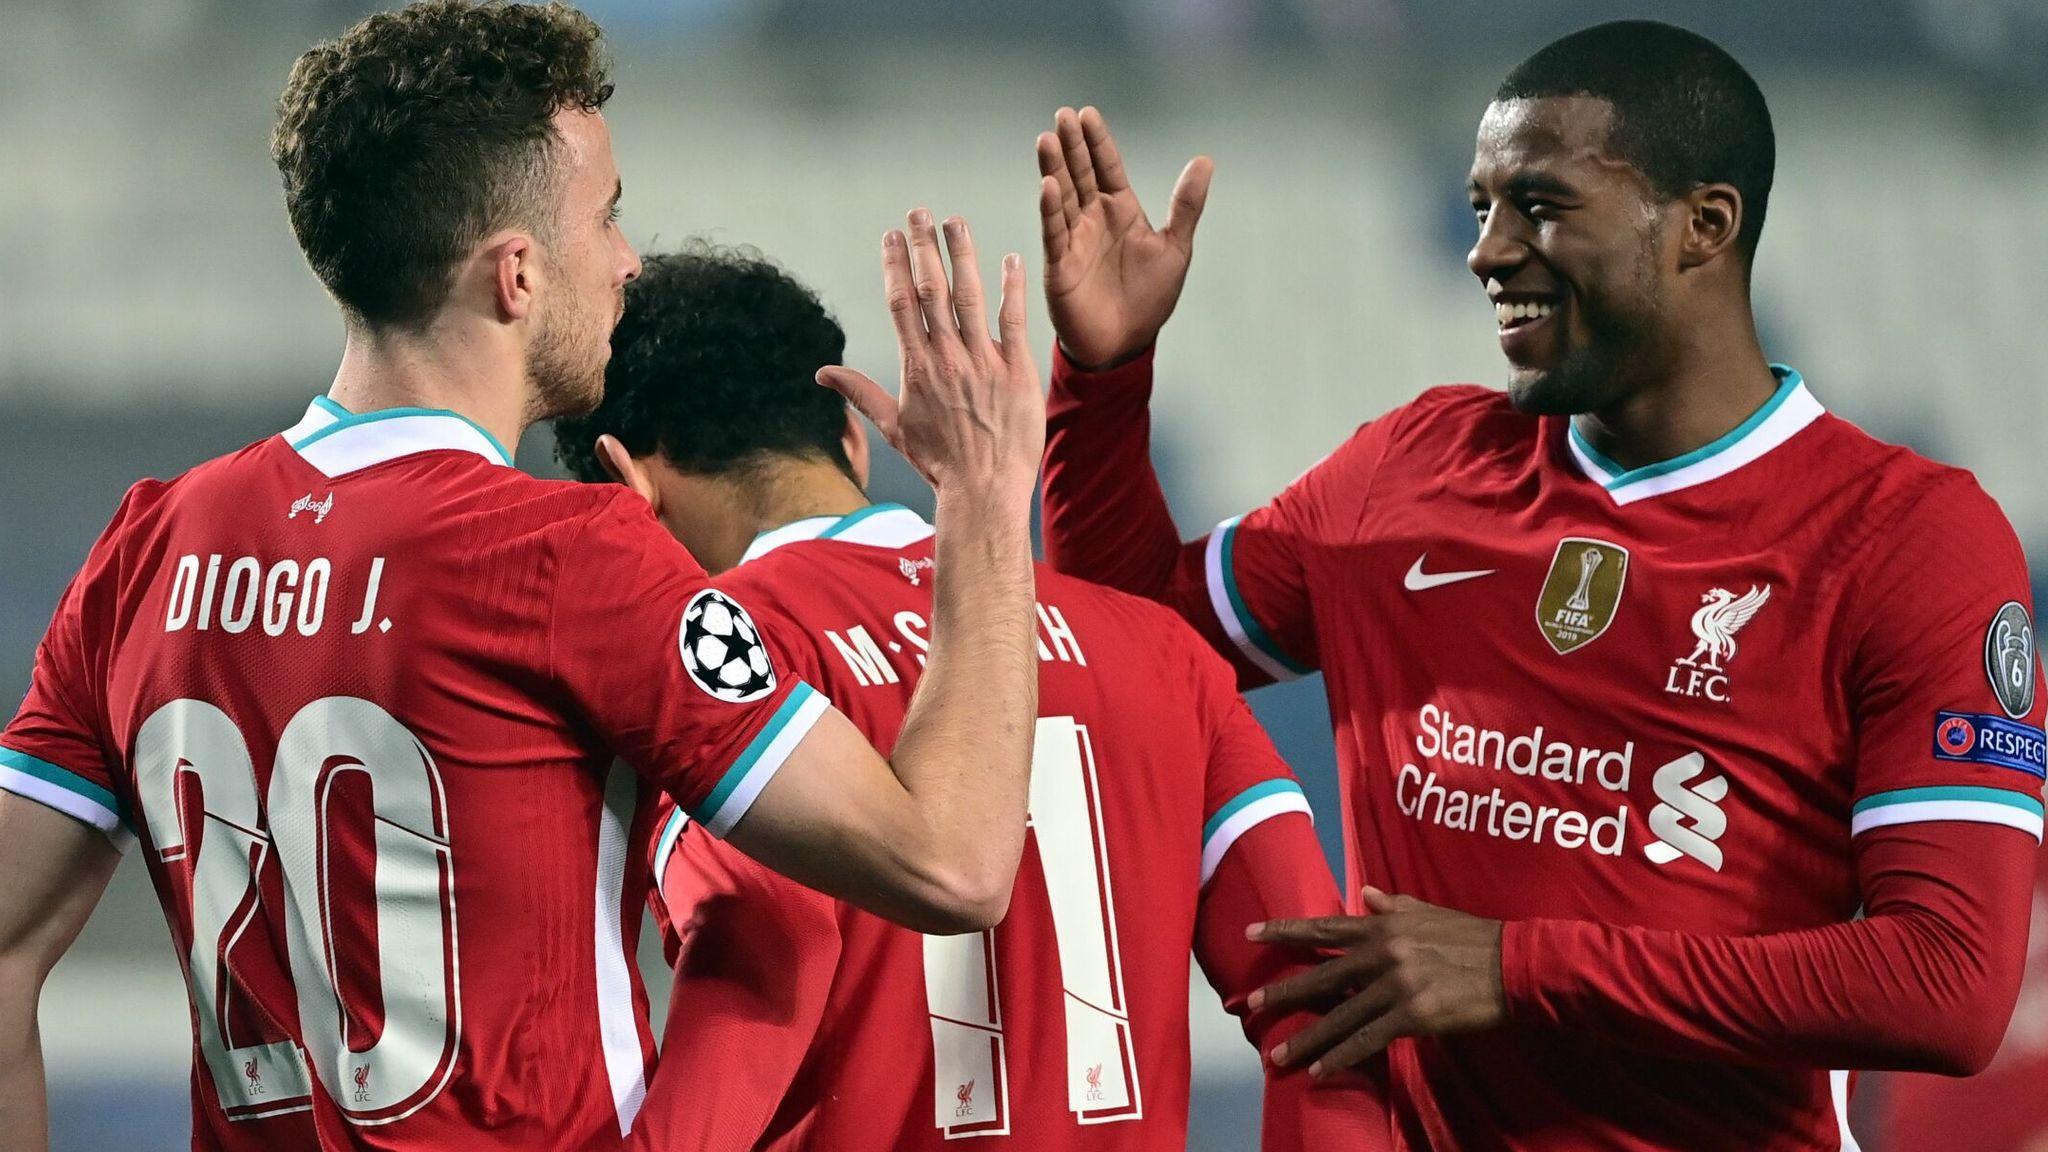 atalanta 0 5 liverpool match report highlights atalanta 0 5 liverpool match report